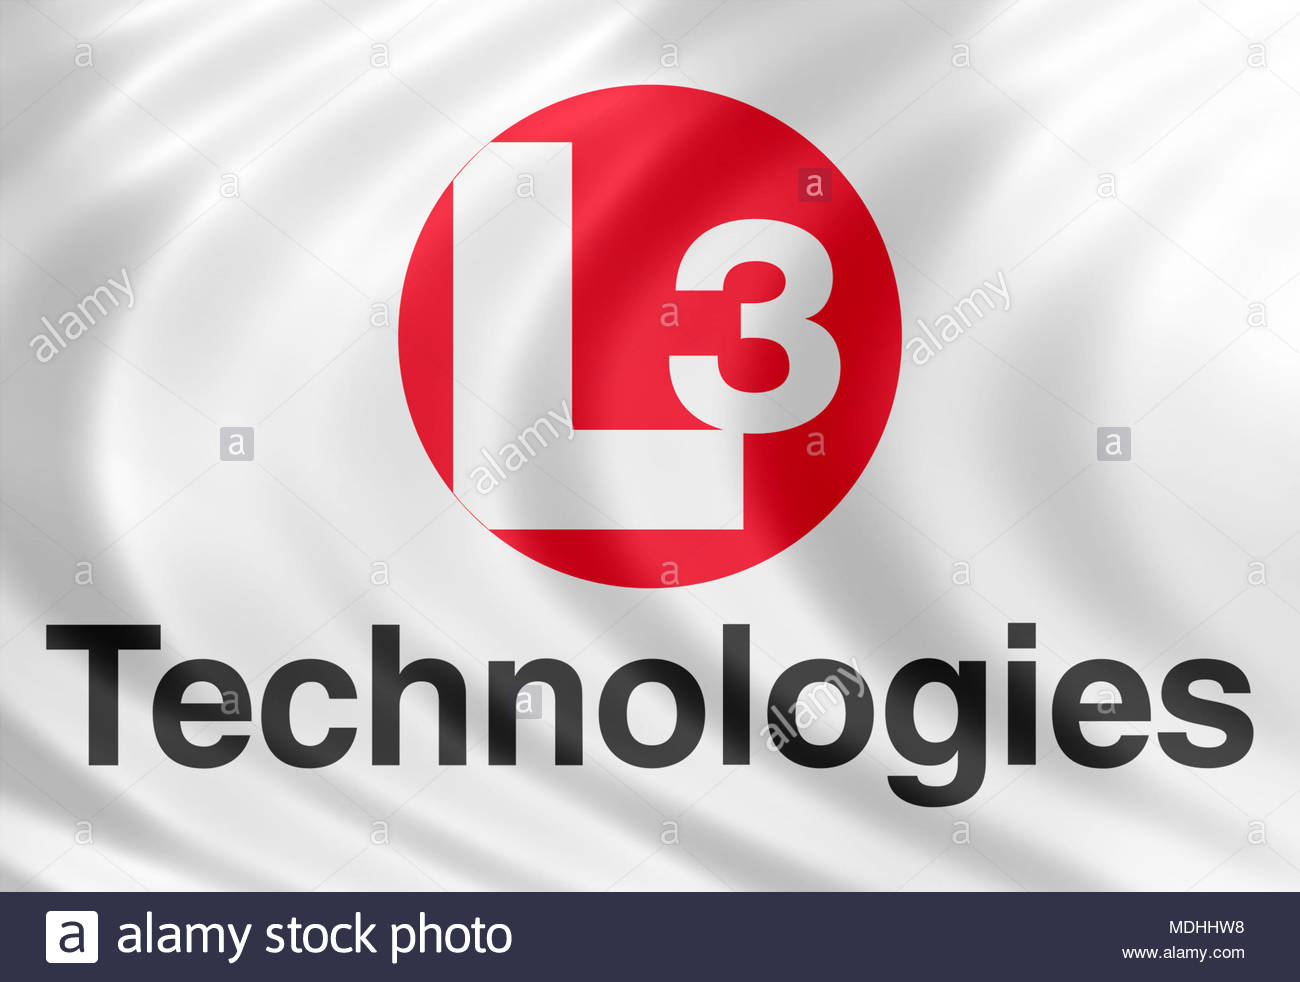 L3 Technologies logo icon sign - Stock Image